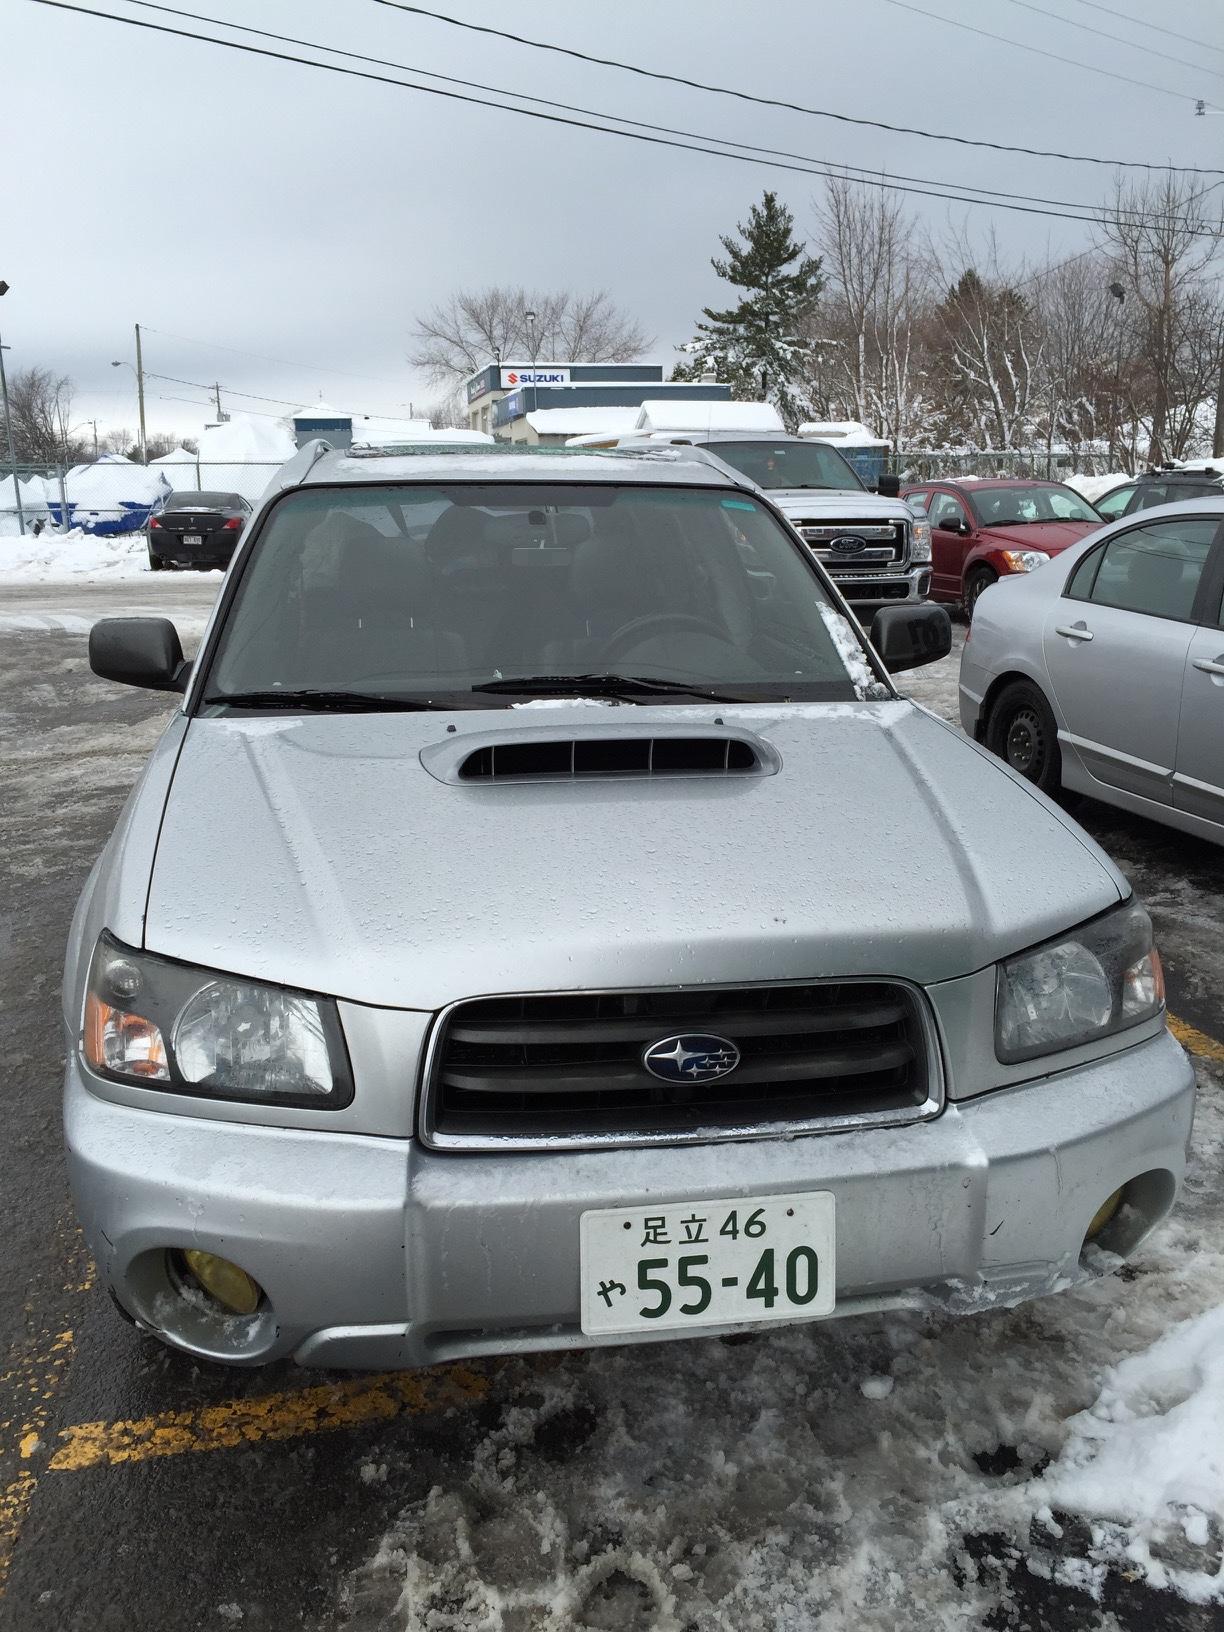 Forrester Strikes Back Most Pimpable Subaru Model